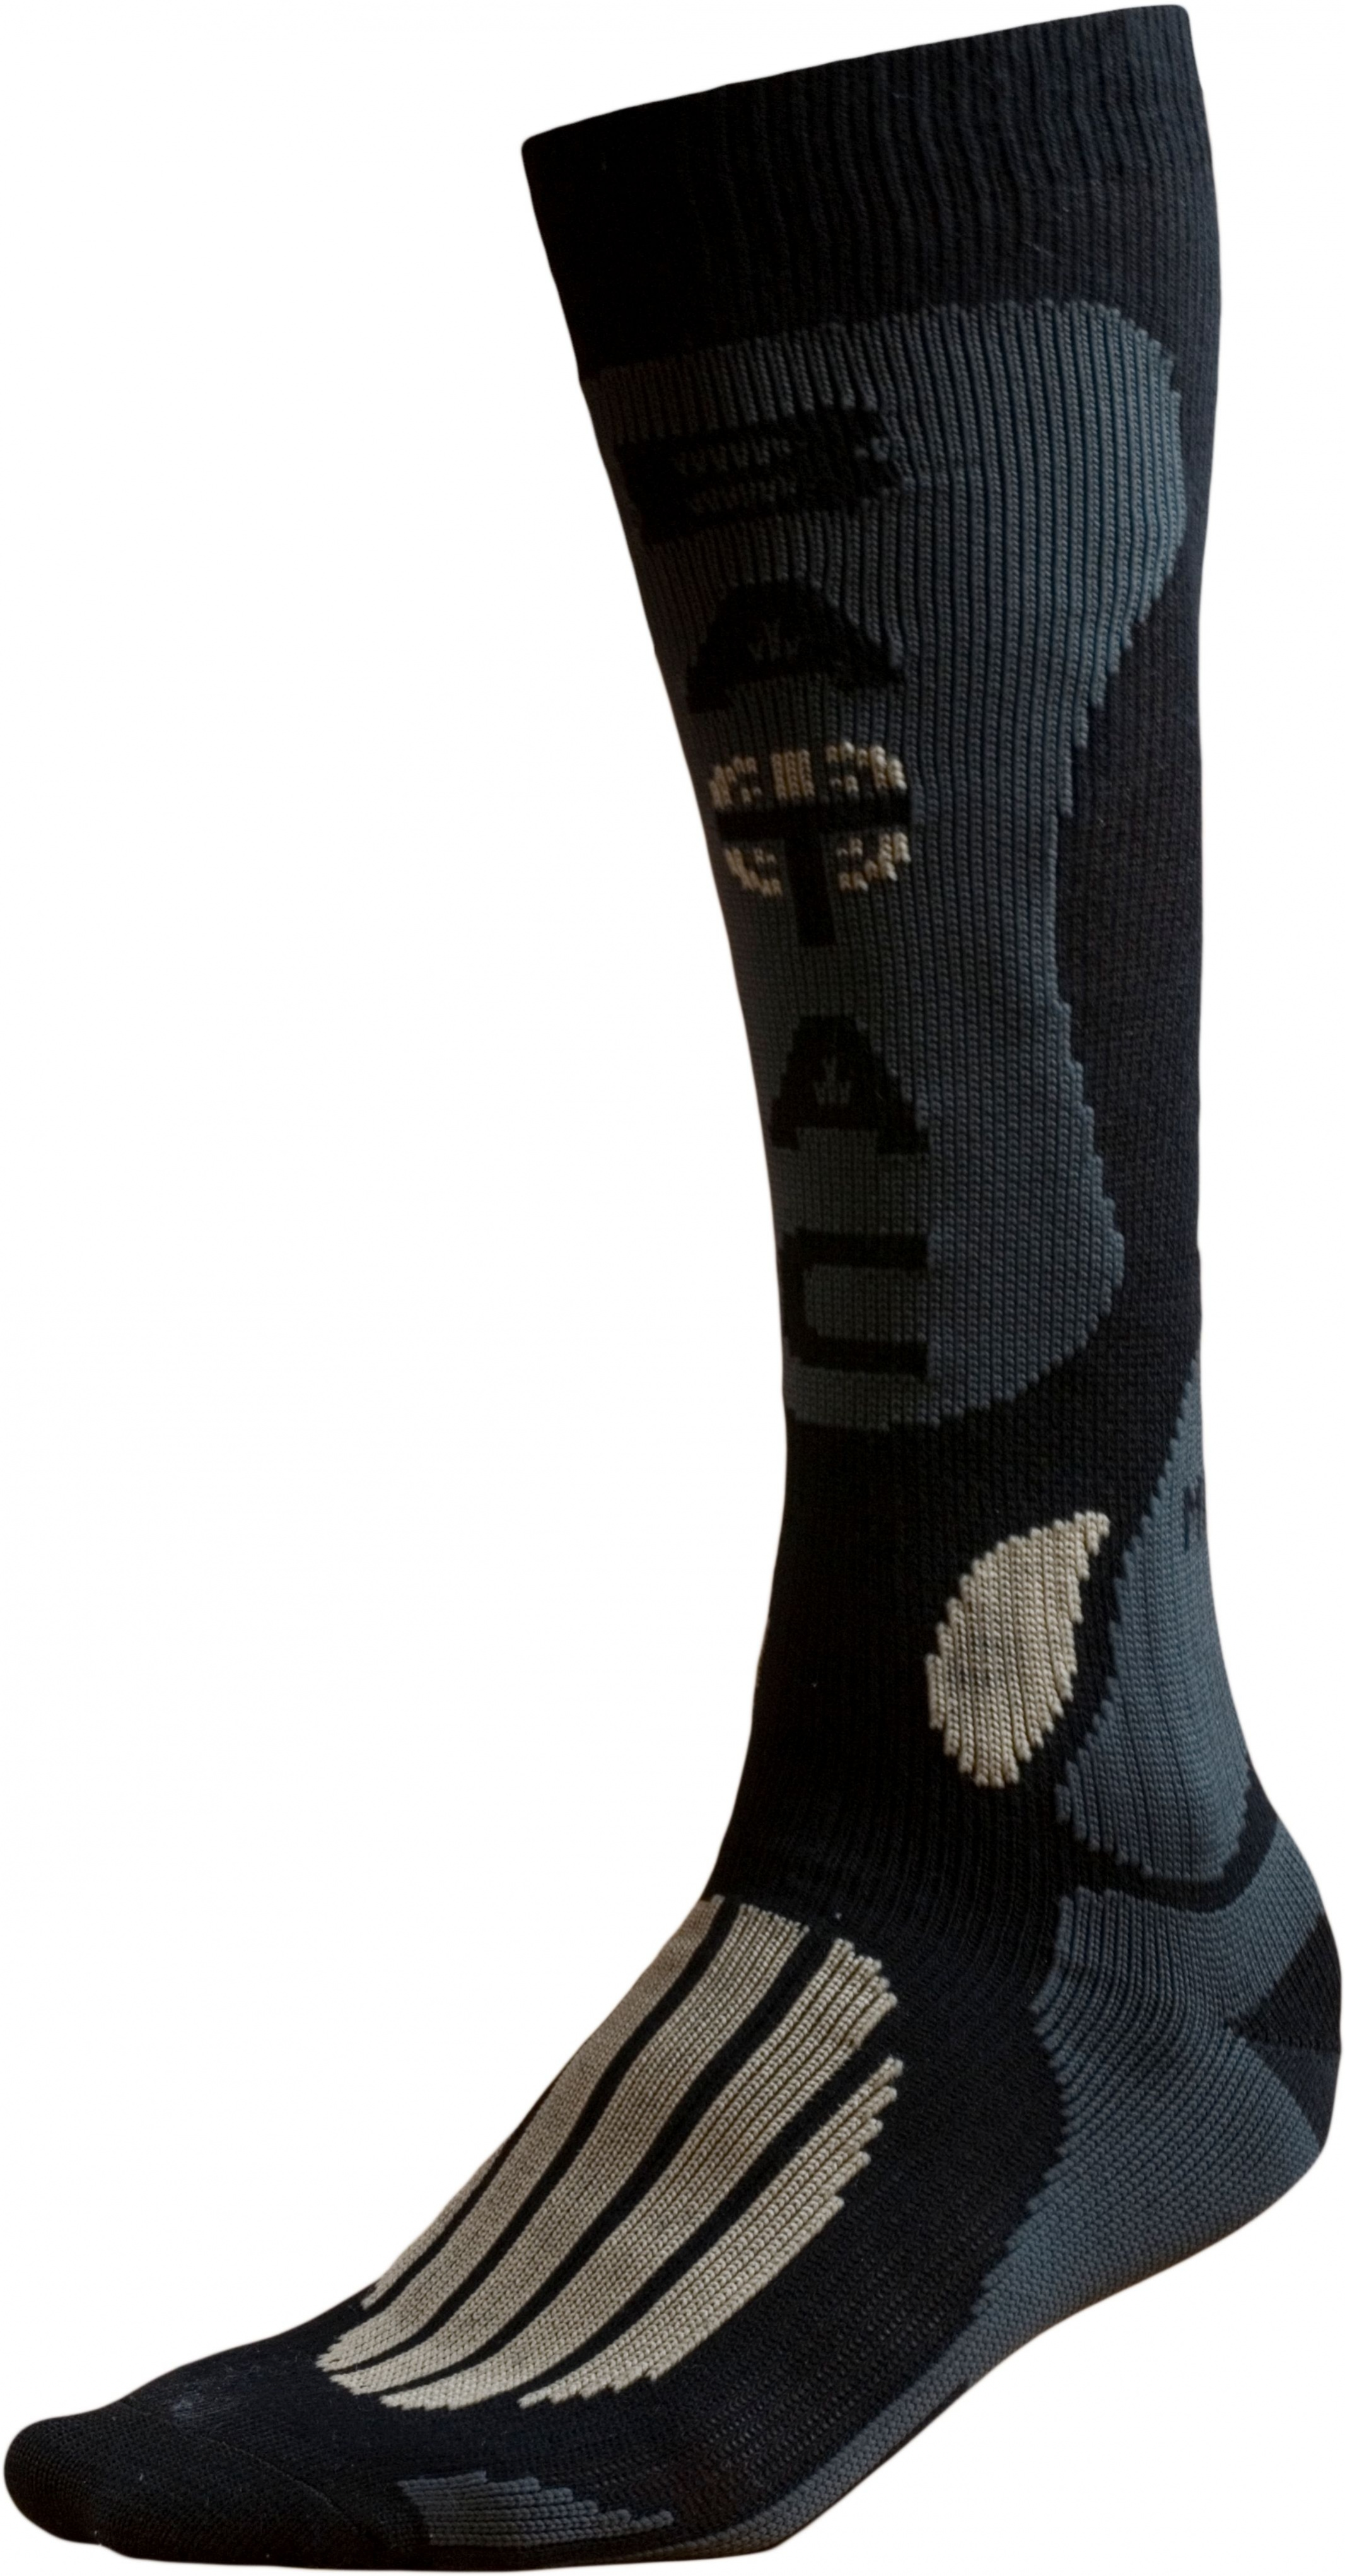 Ponožky BATAC Mission MI01 vel. 34-35 - black/gold